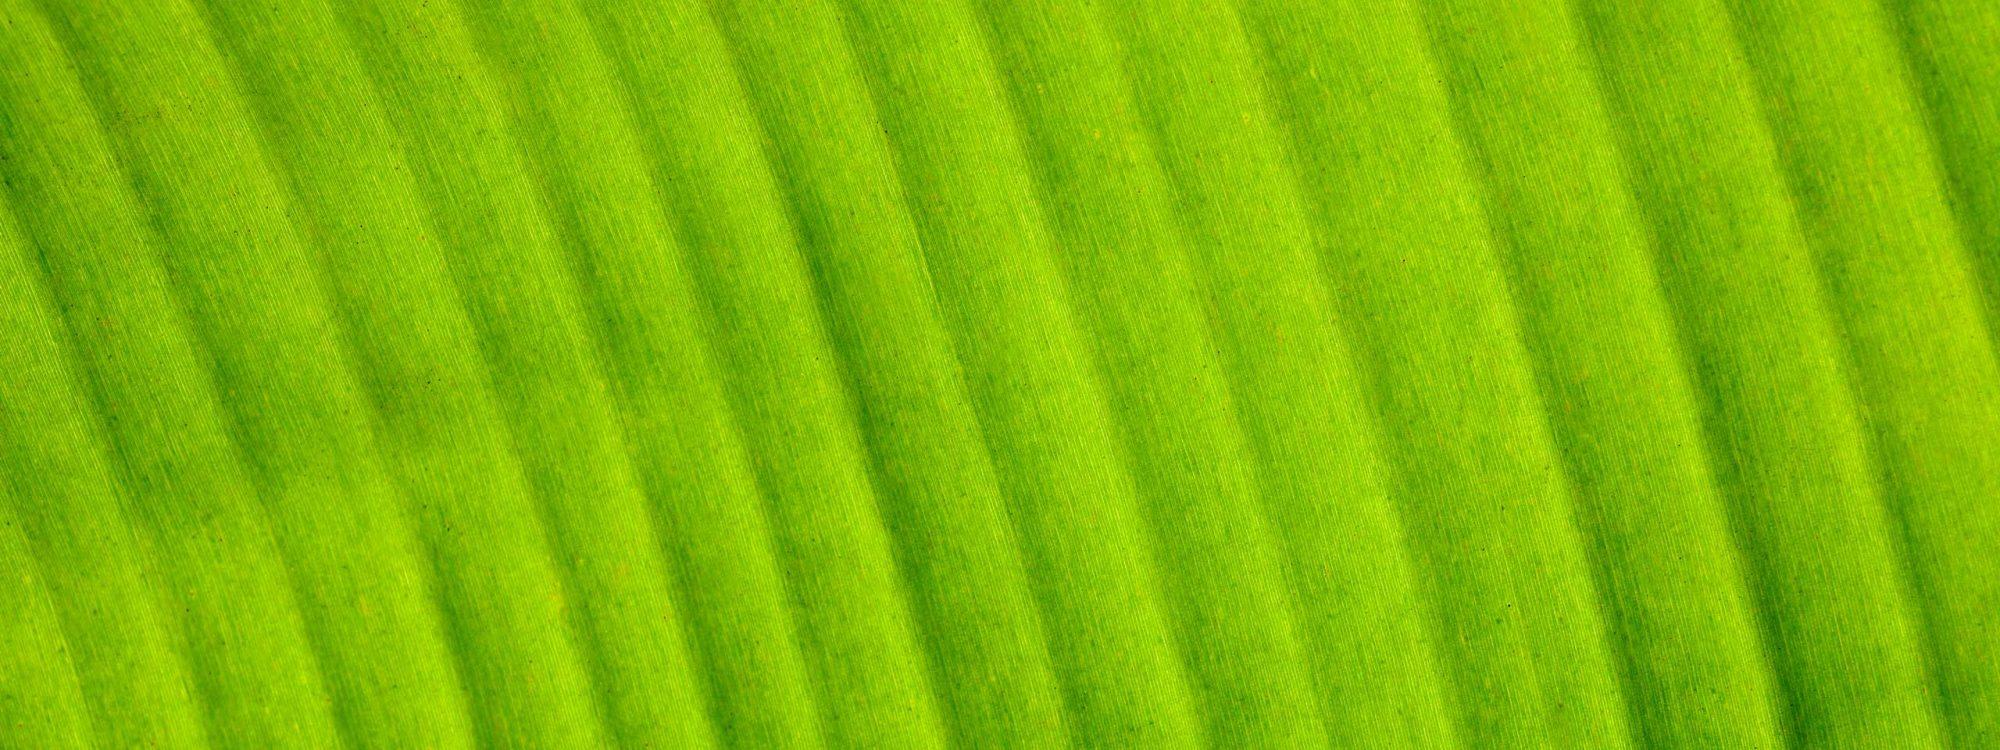 textura-vegetal-1